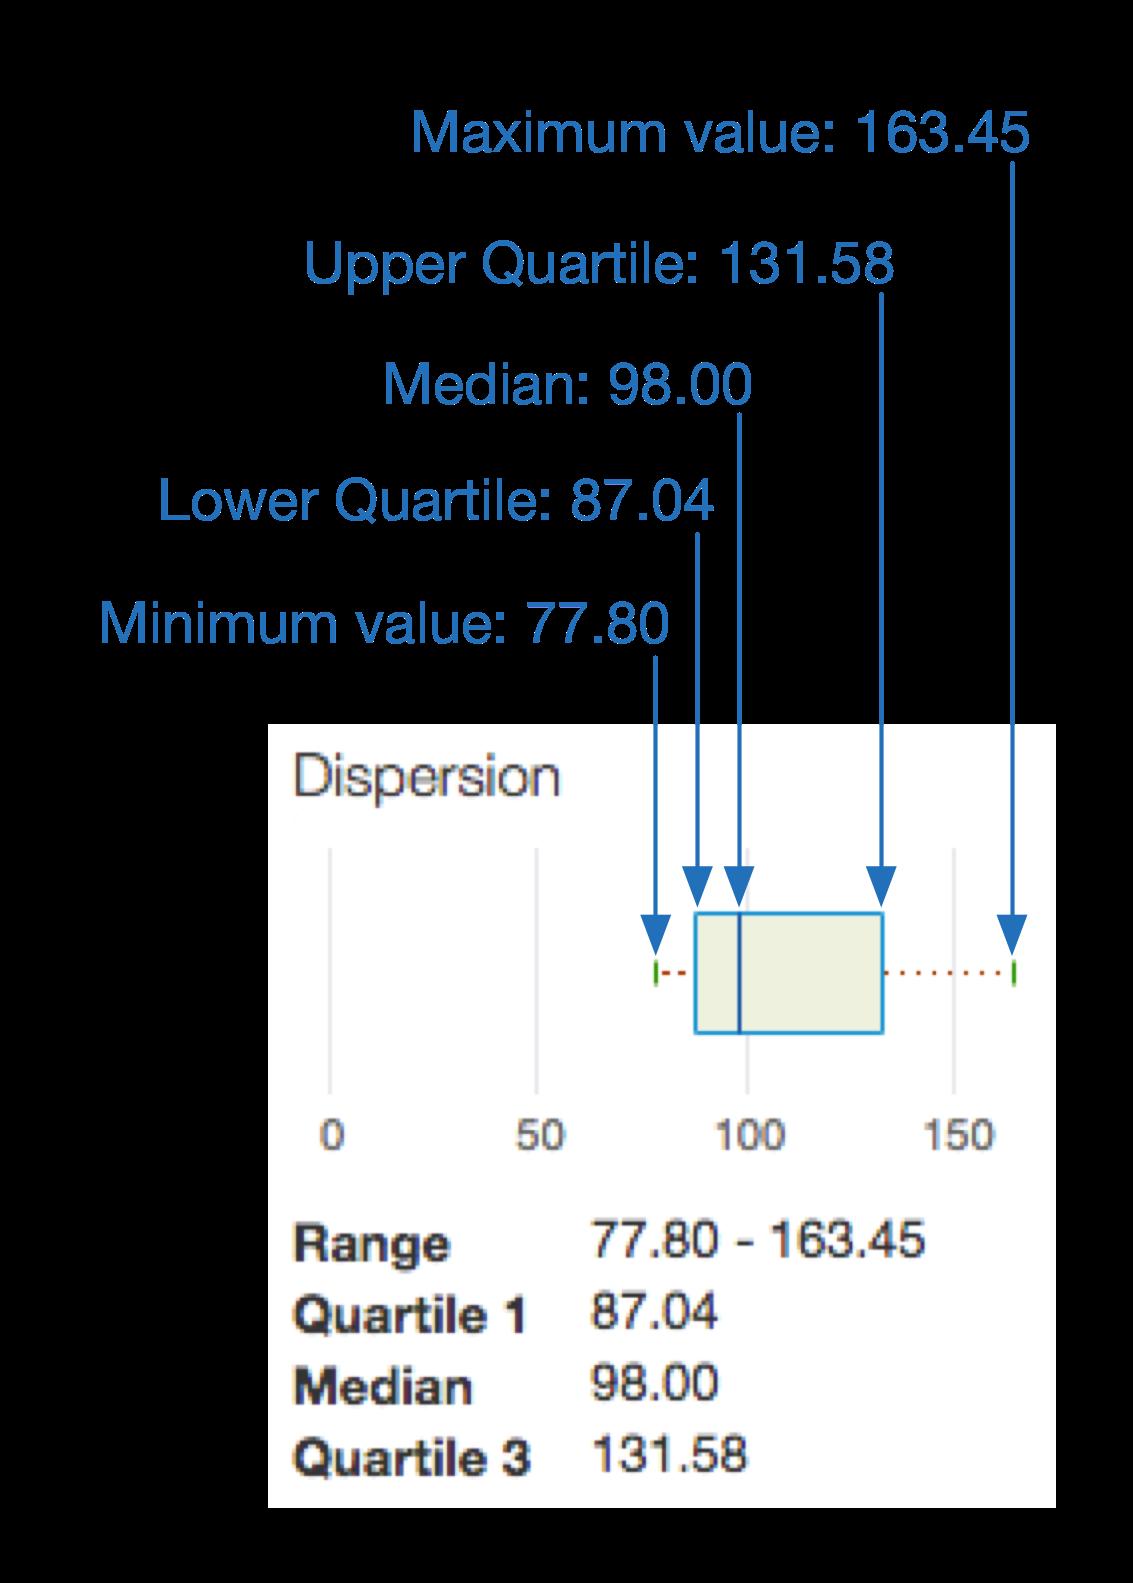 A closeup of the dispersion box plot shows where to find the minimum value, lower     quartile, median, upper quartile, and maximum value.